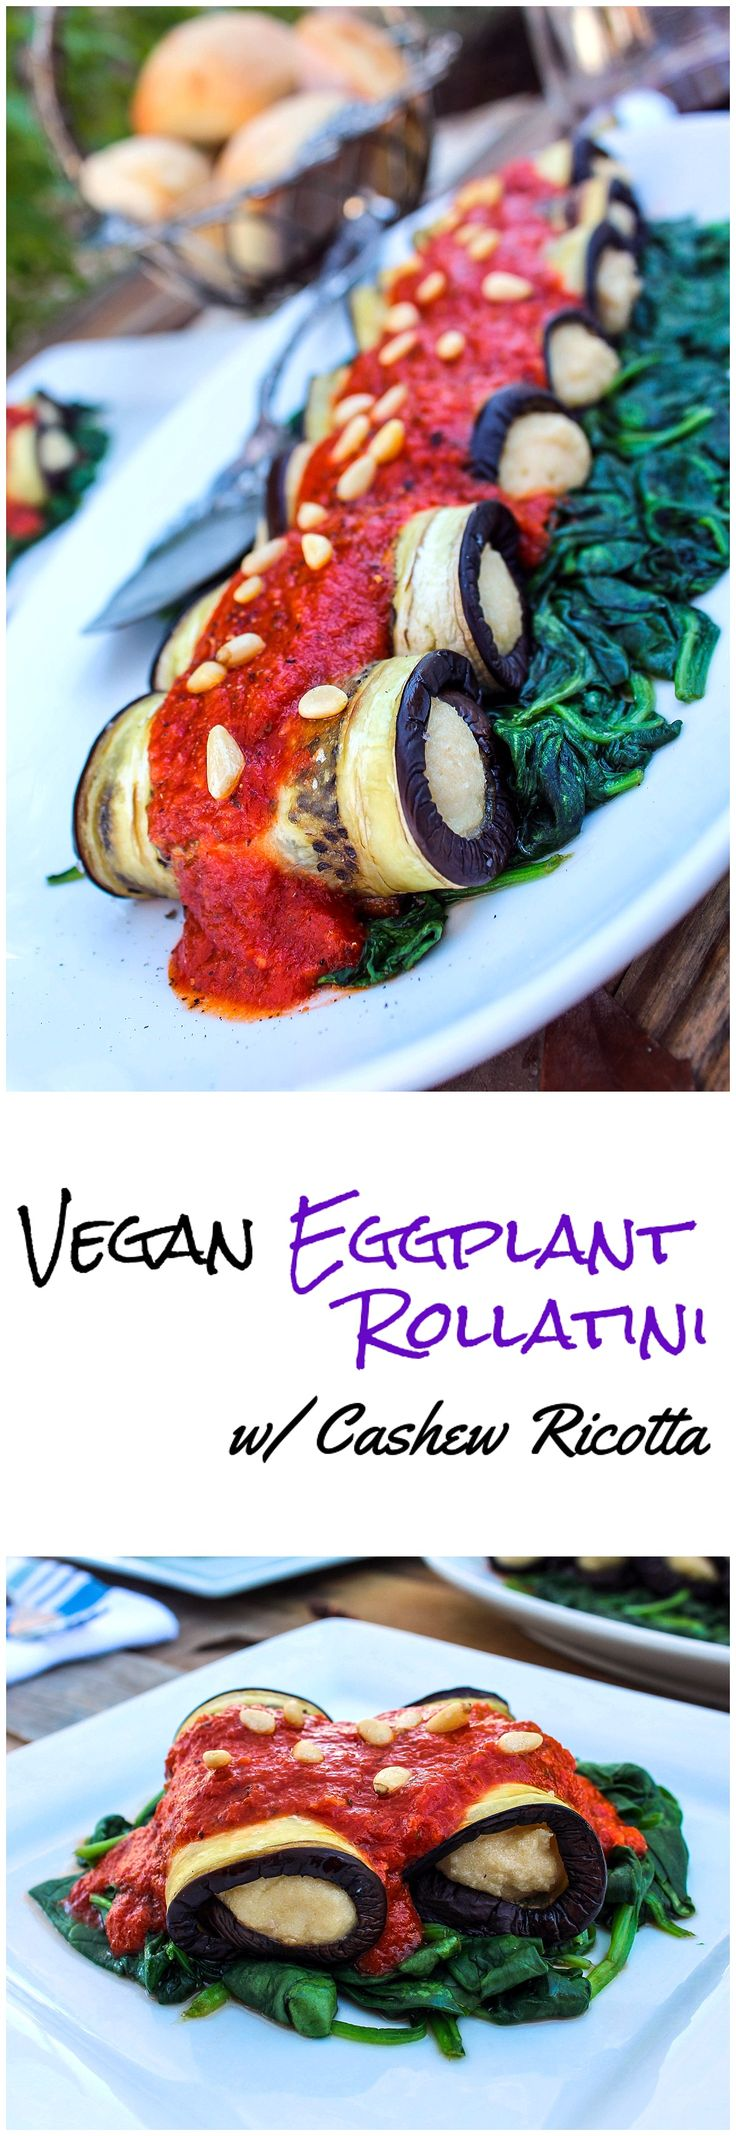 Vegan Eggplant Rollatini with Cashew Ricotta - http://veganhuggs.com/eggplant-rollatini-2/